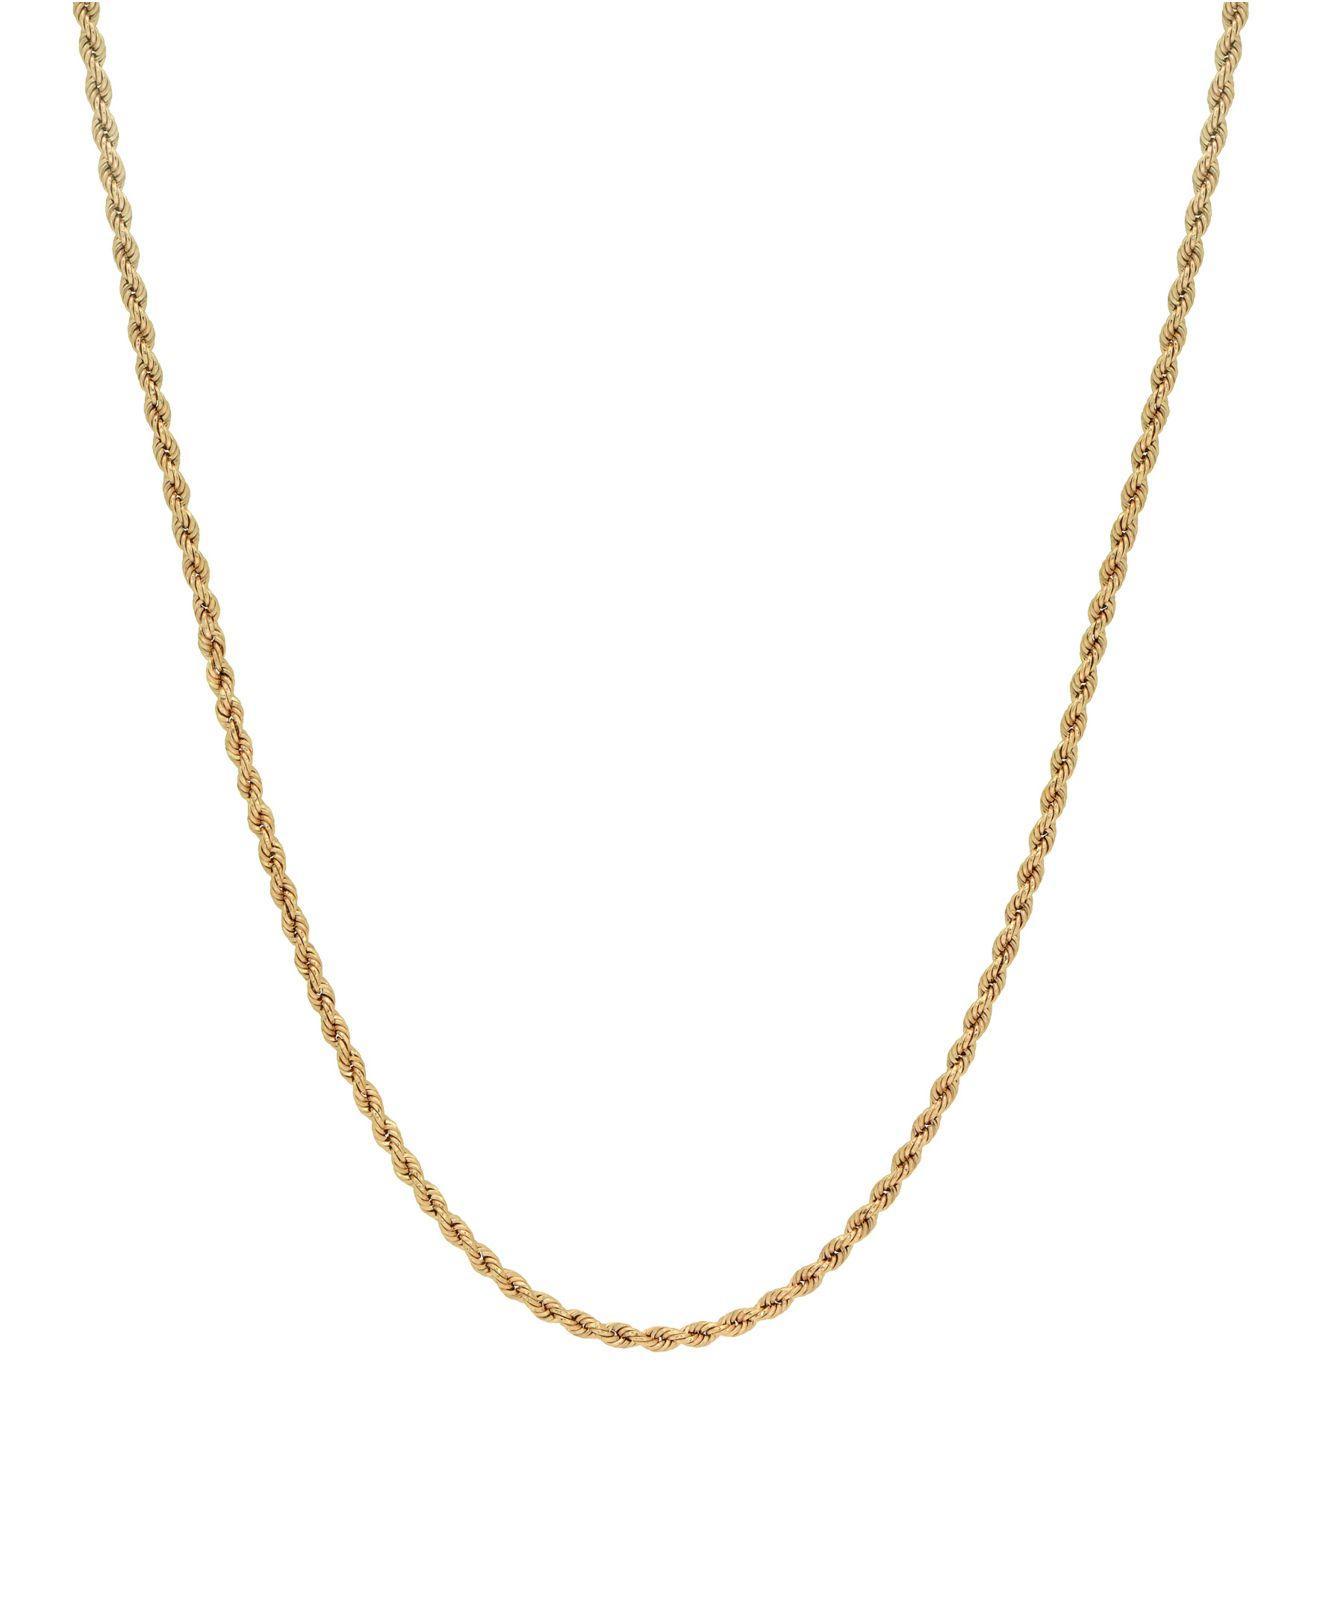 400c37faf5527 Women's Metallic Rope Link 22